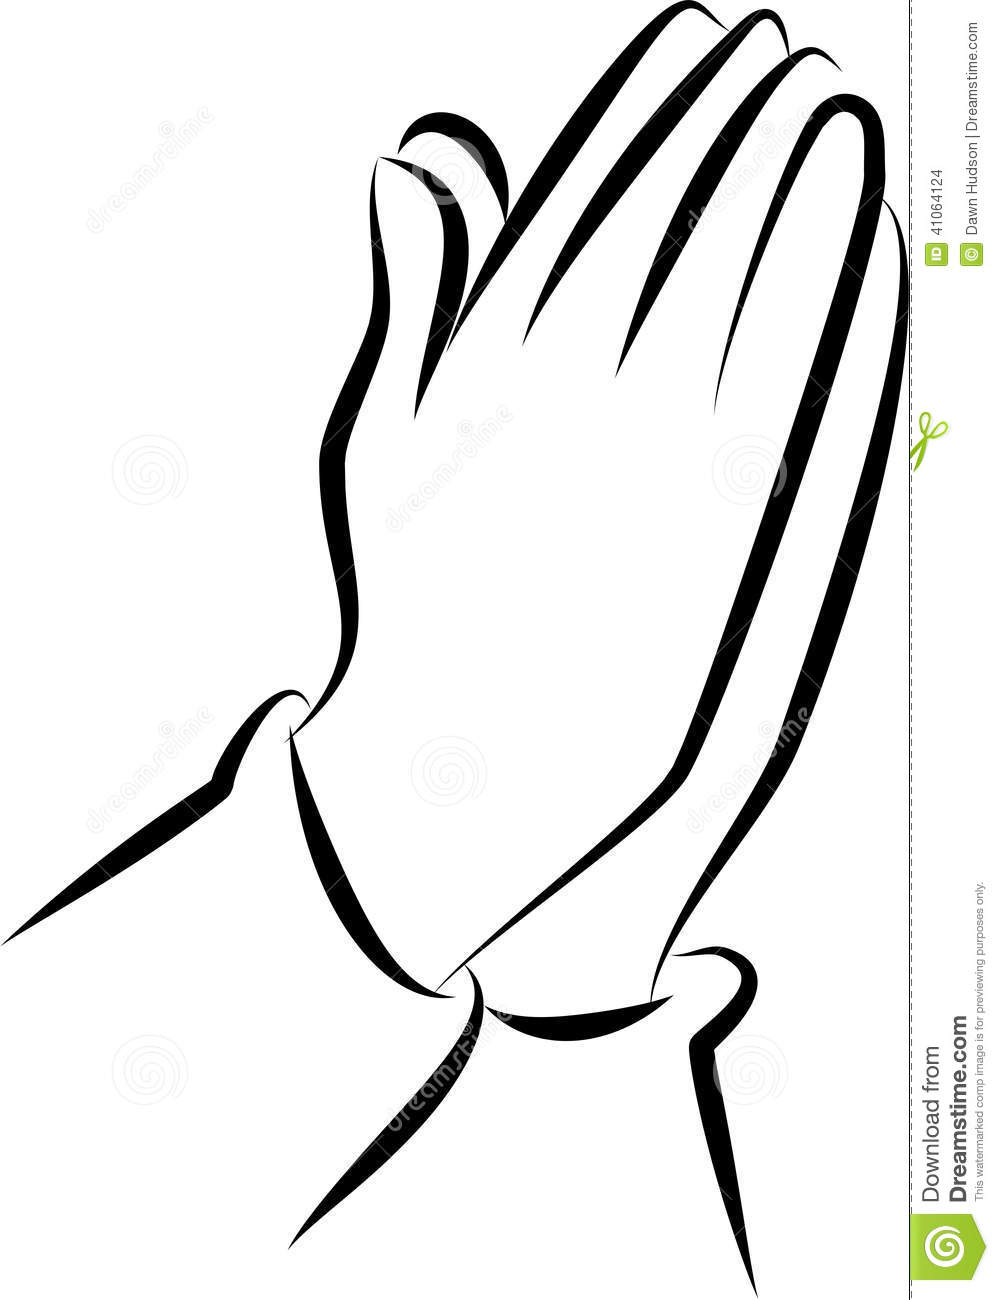 999x1300 Praying Hands Clip Art Simple Black White Line Drawing Pair